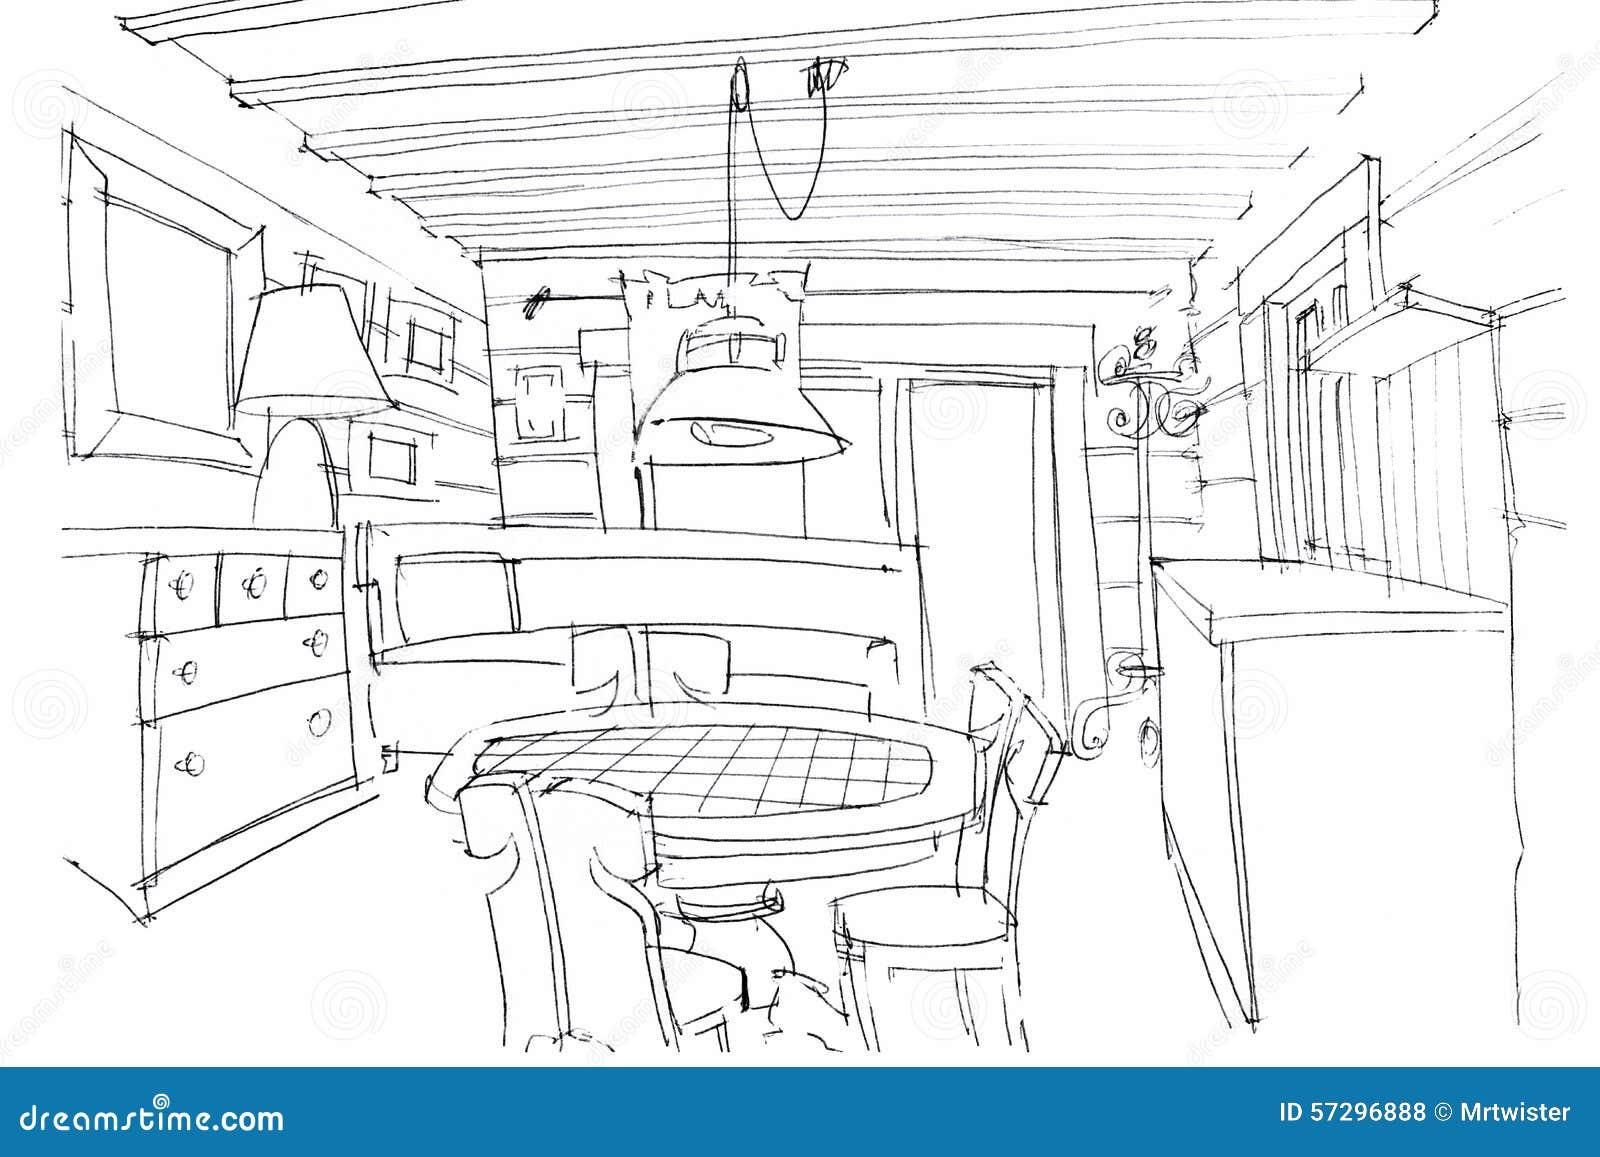 Hand sketching of a modern kitchen interior stock for Interior designs kitchen sketches